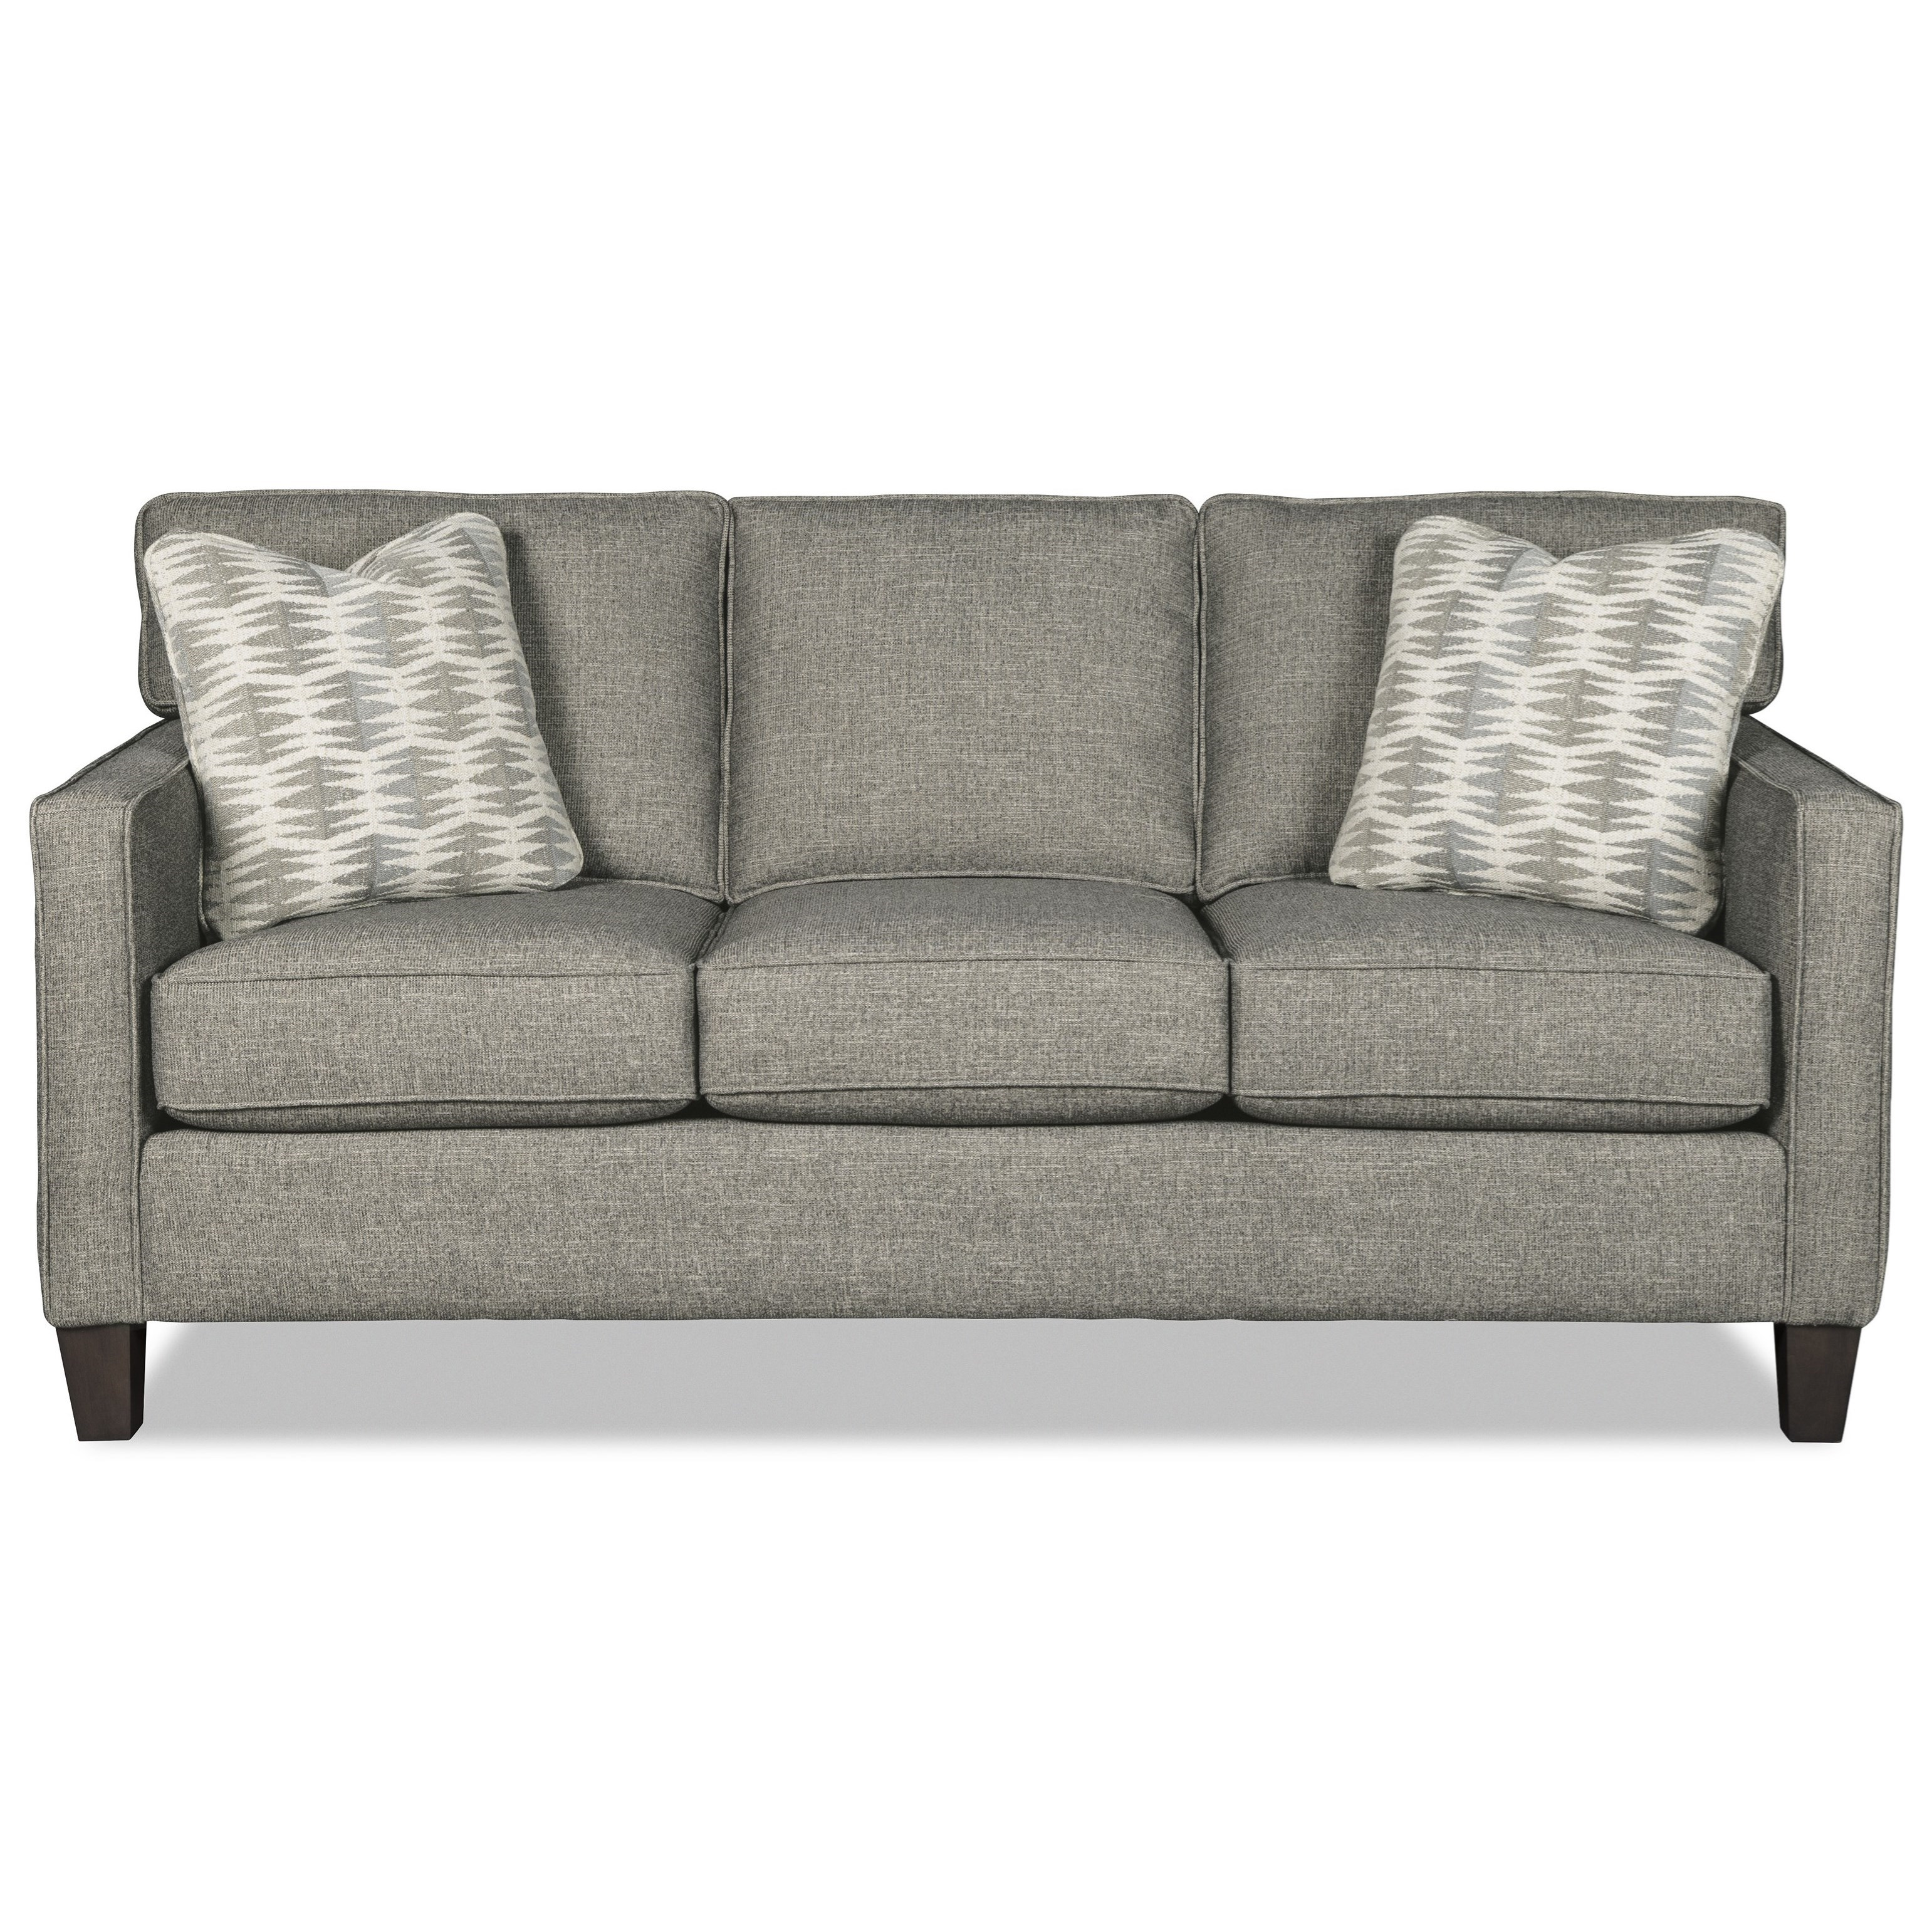 M9 Custom - Design Options Customizable Sofa by Craftmaster at Baer's Furniture